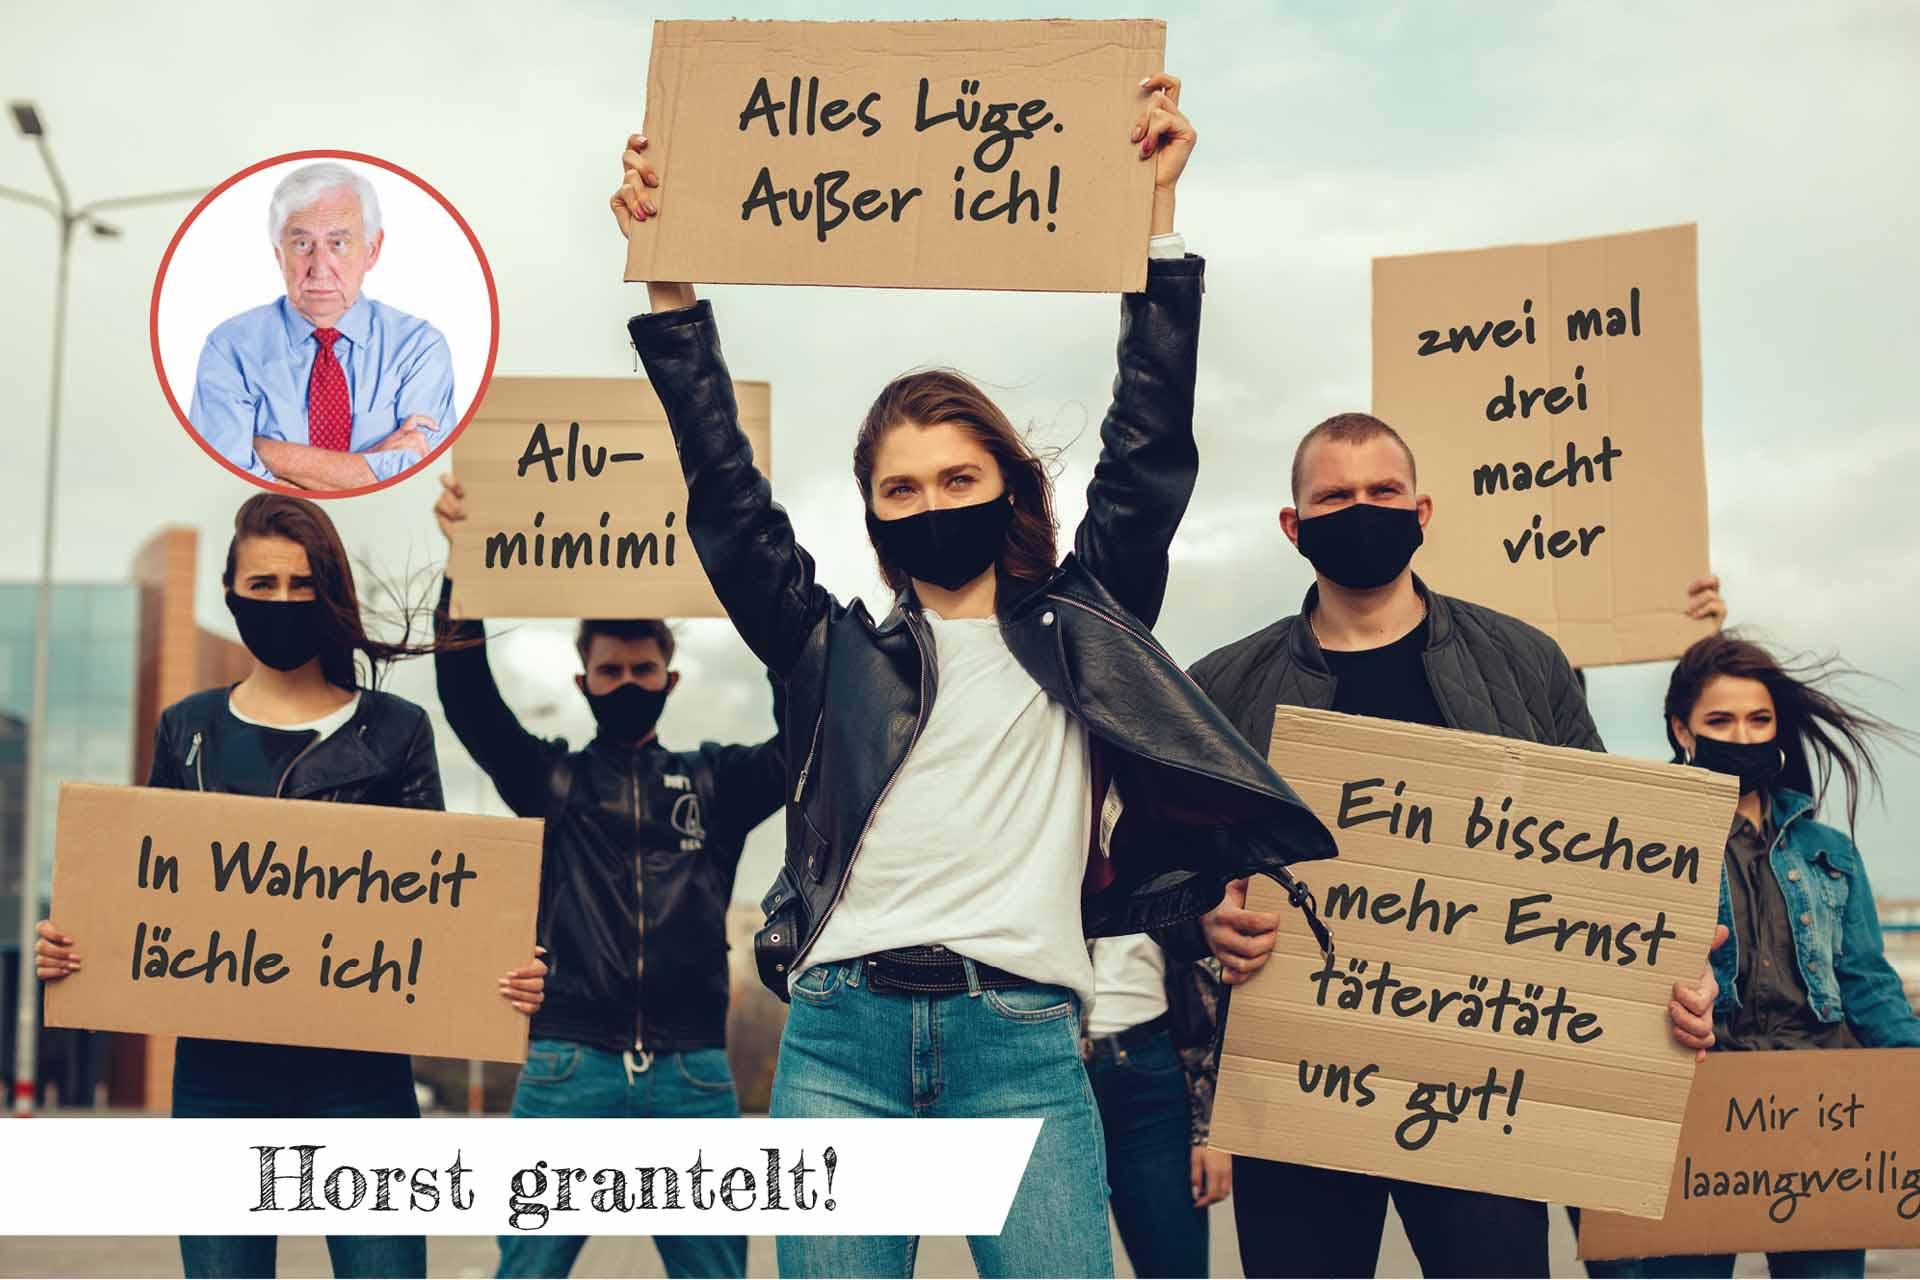 Horst grantelt - Alles nur Staatspropaganda